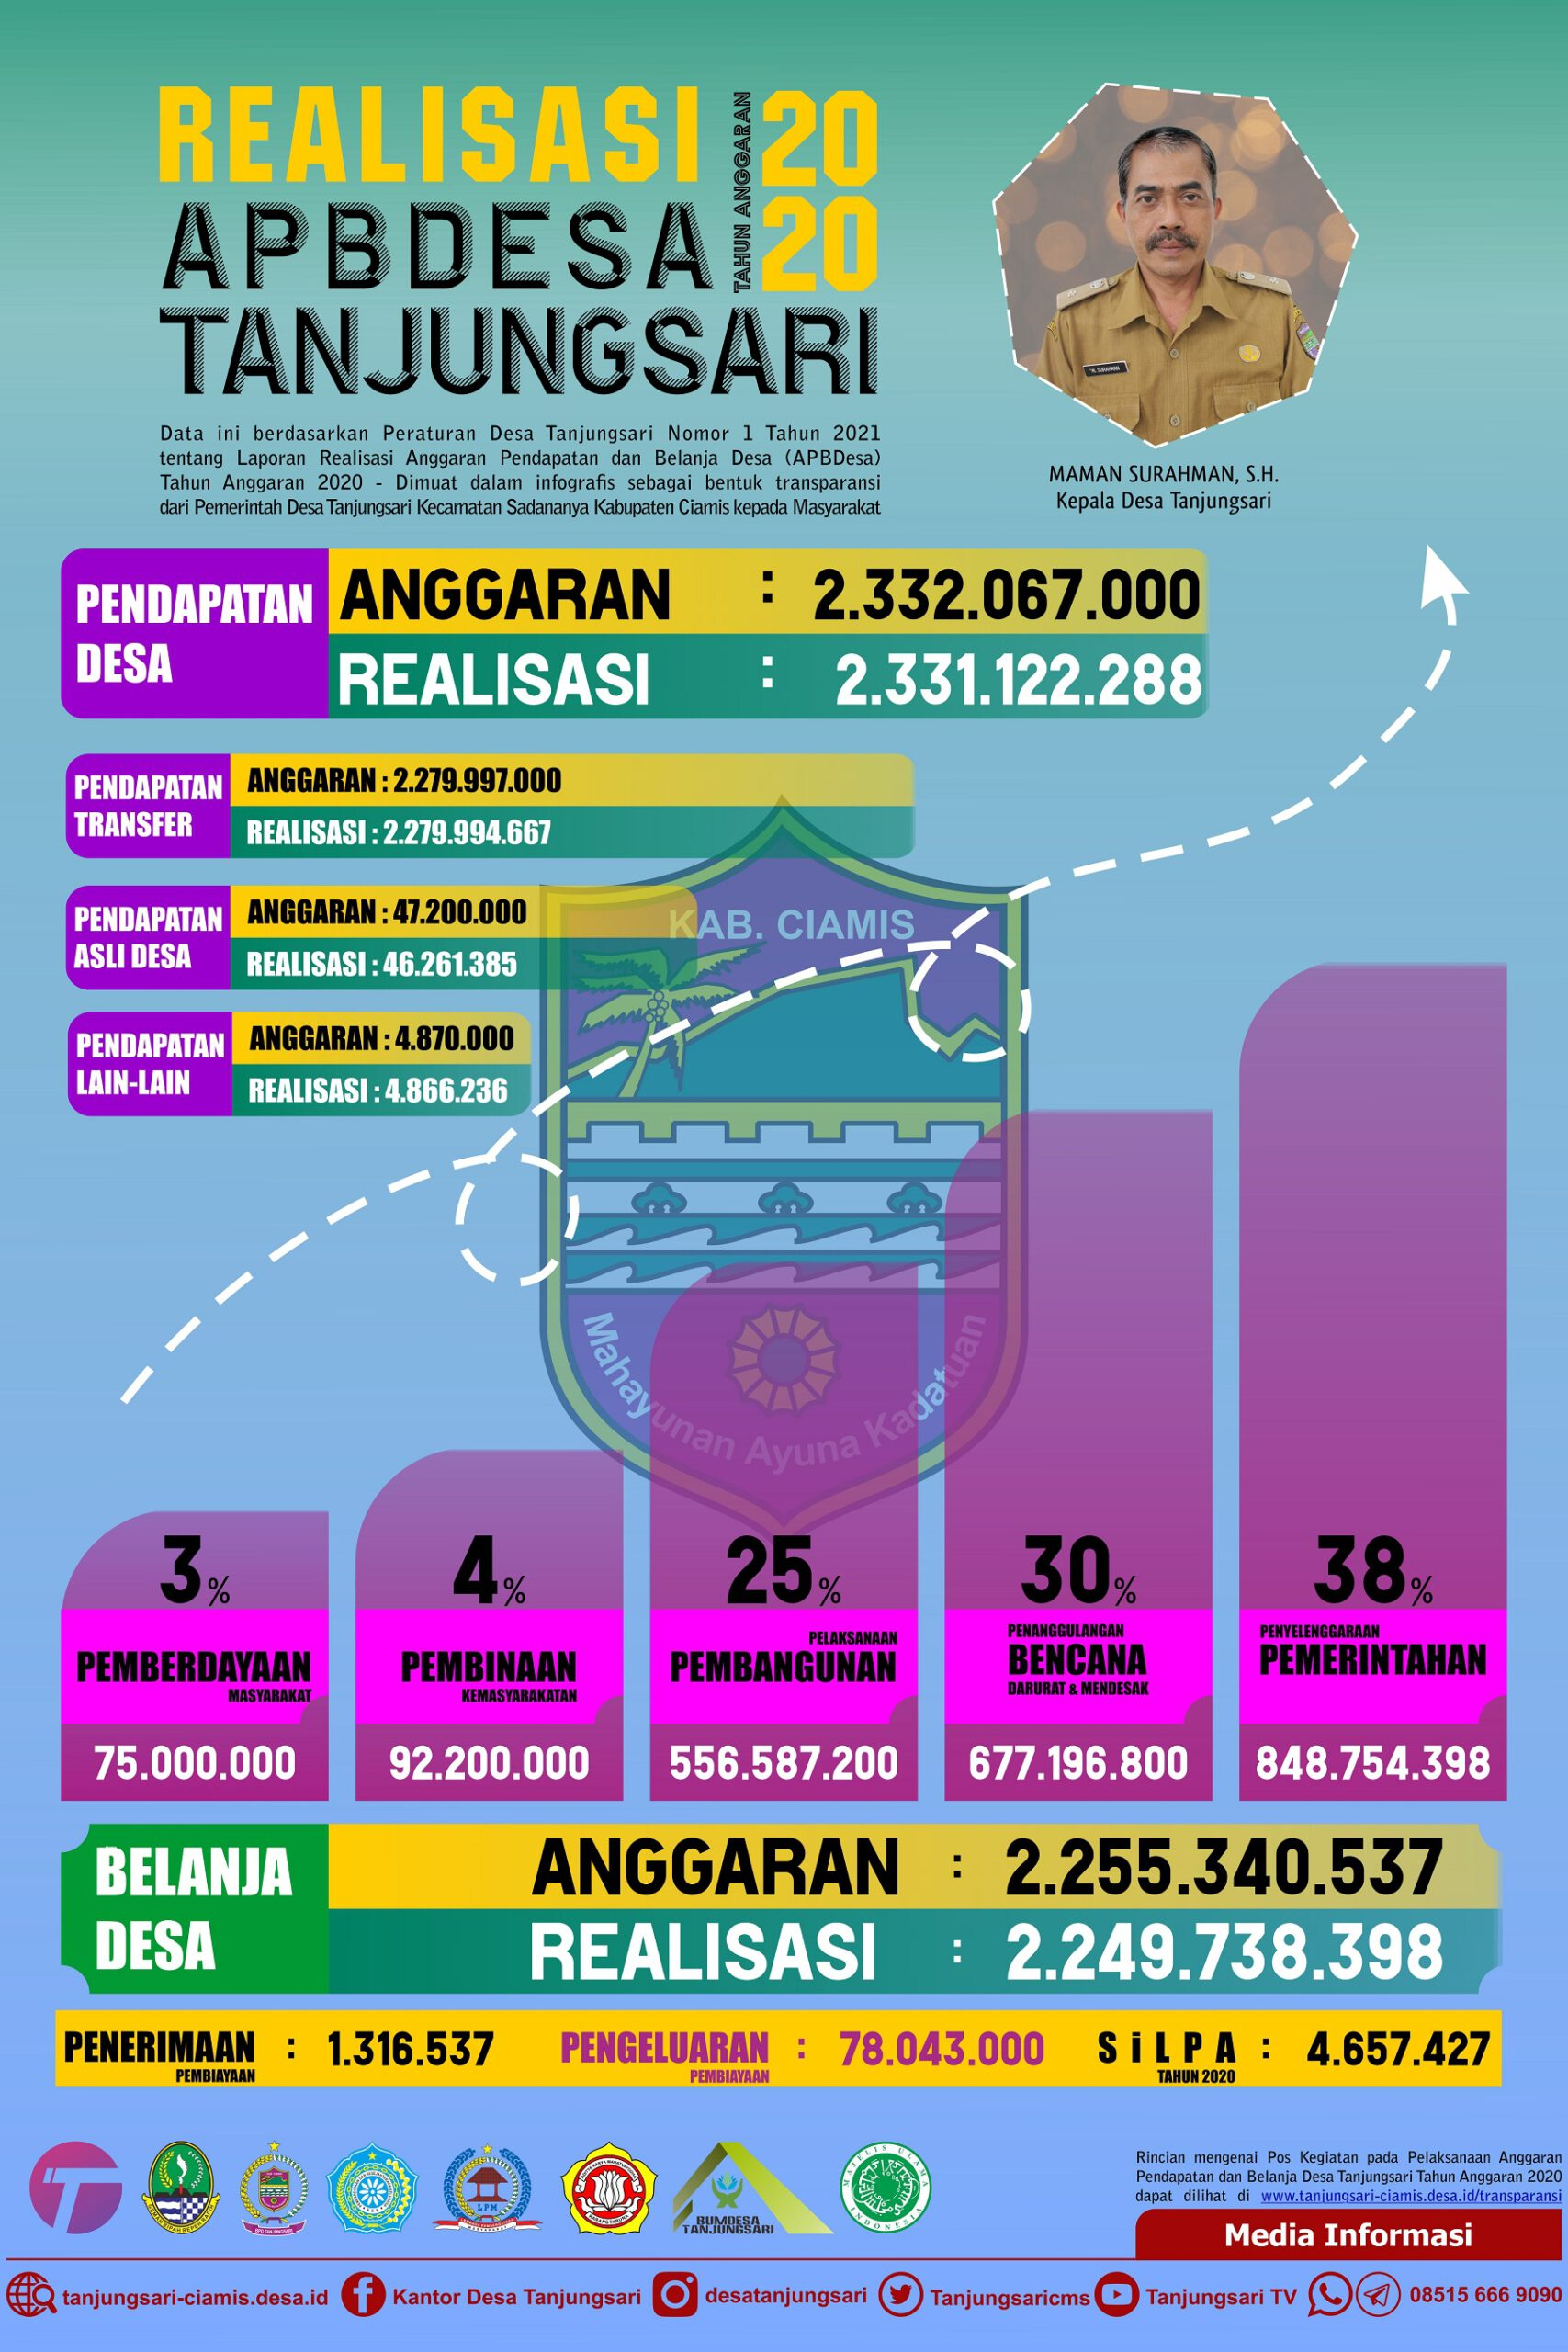 Inforafik Lap. Realisasi APBDesa Tanjungsari 2020